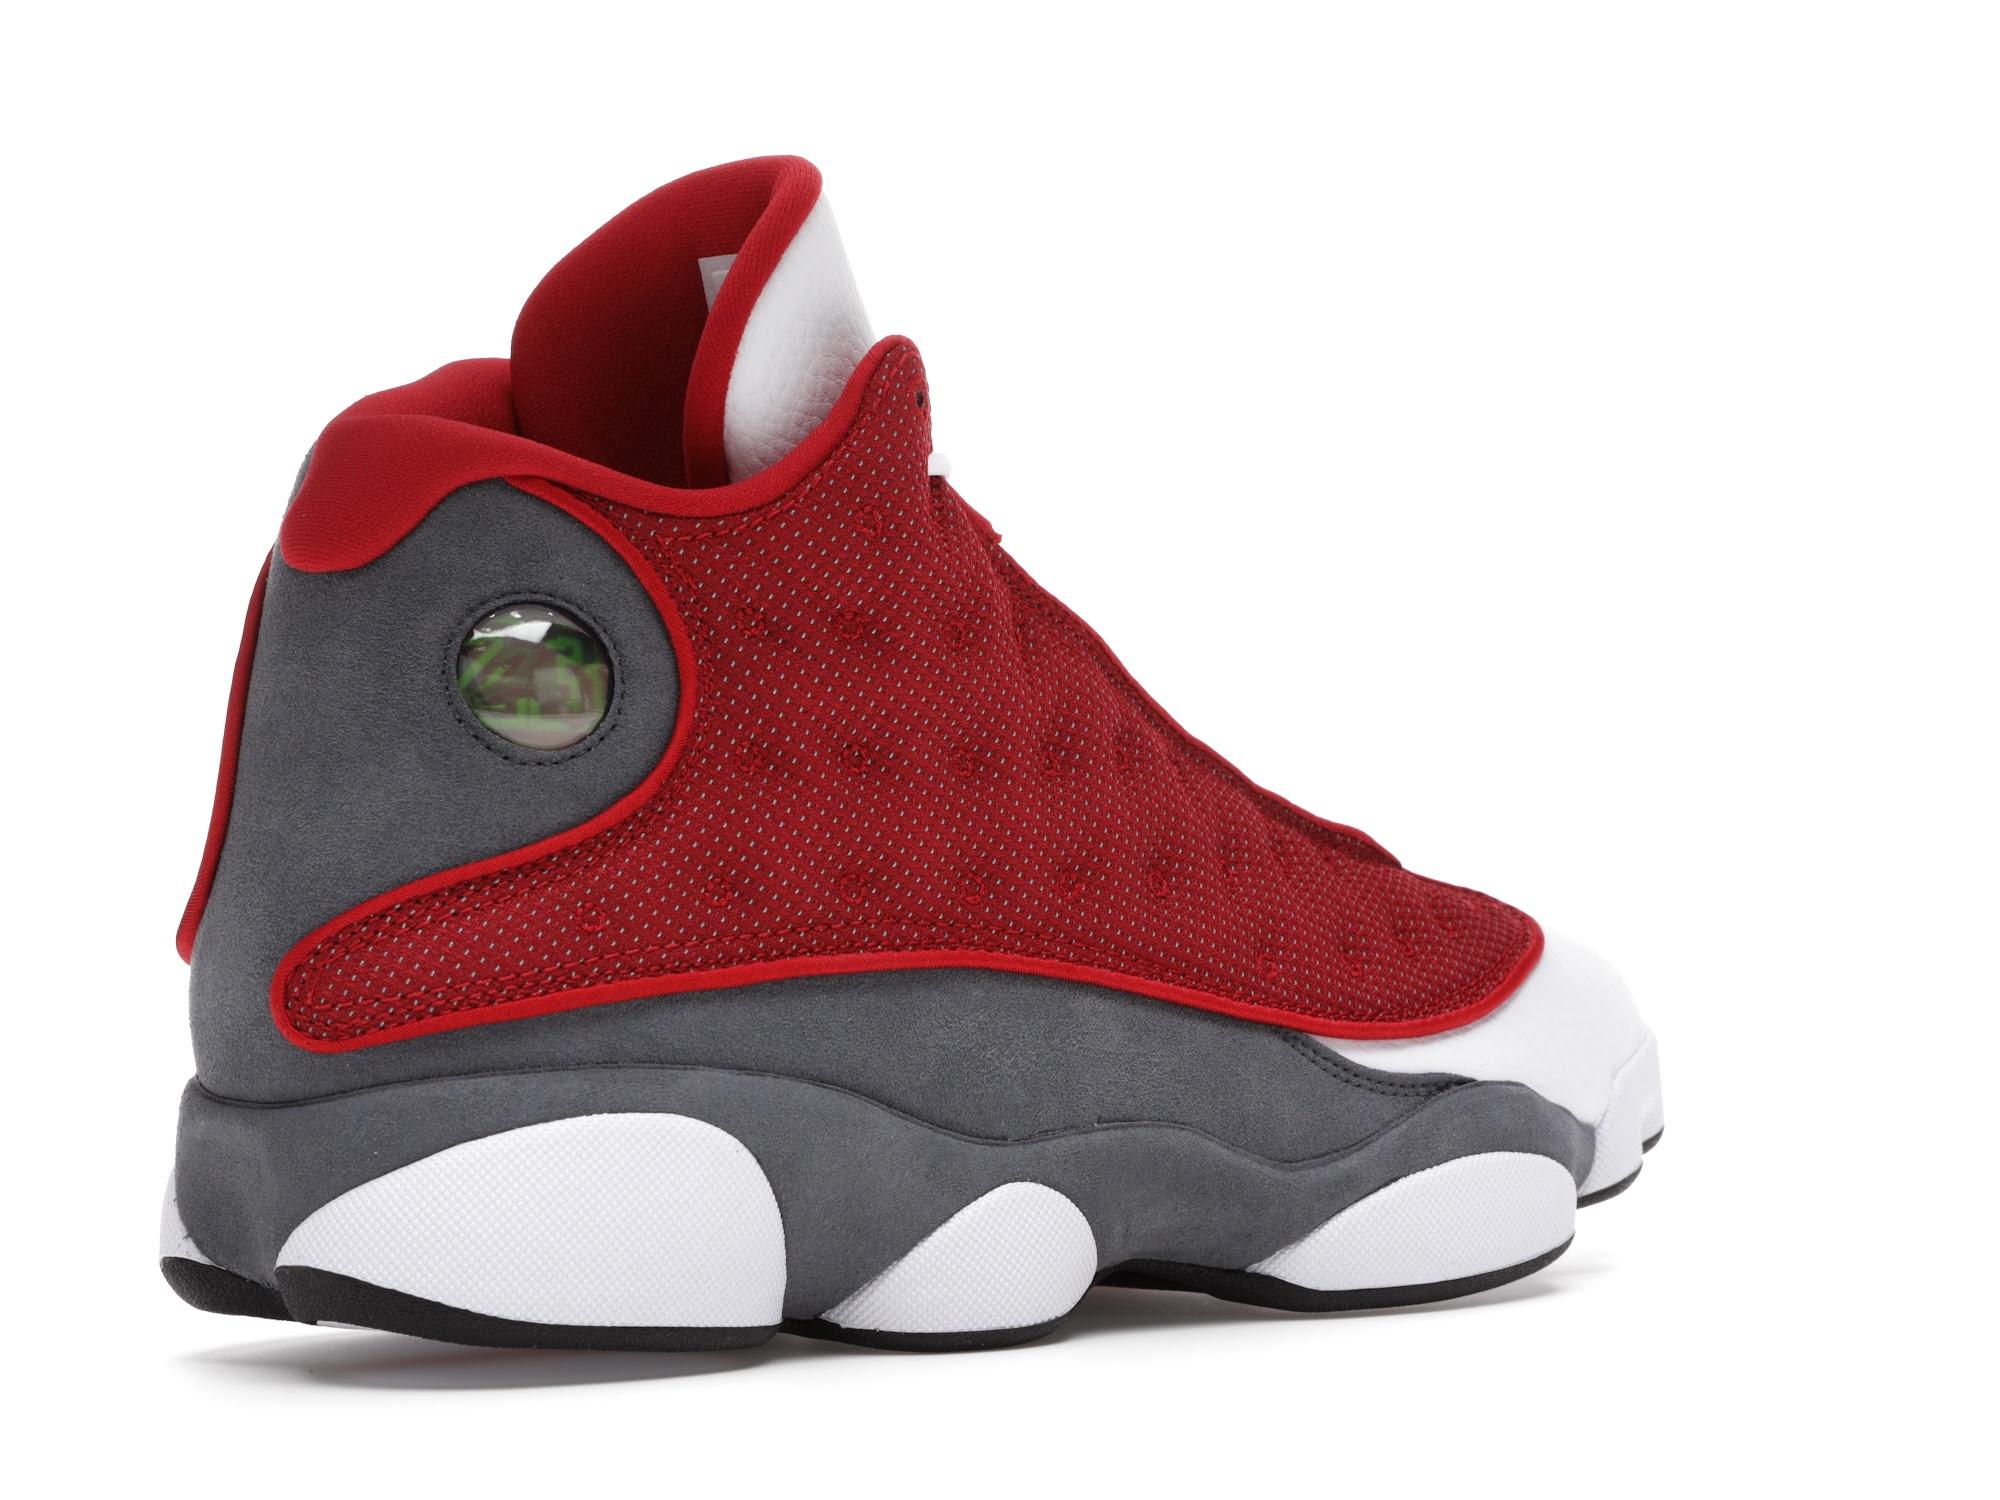 Jordan 13 Retro Gym Red Flint Grey - DJ5982-600